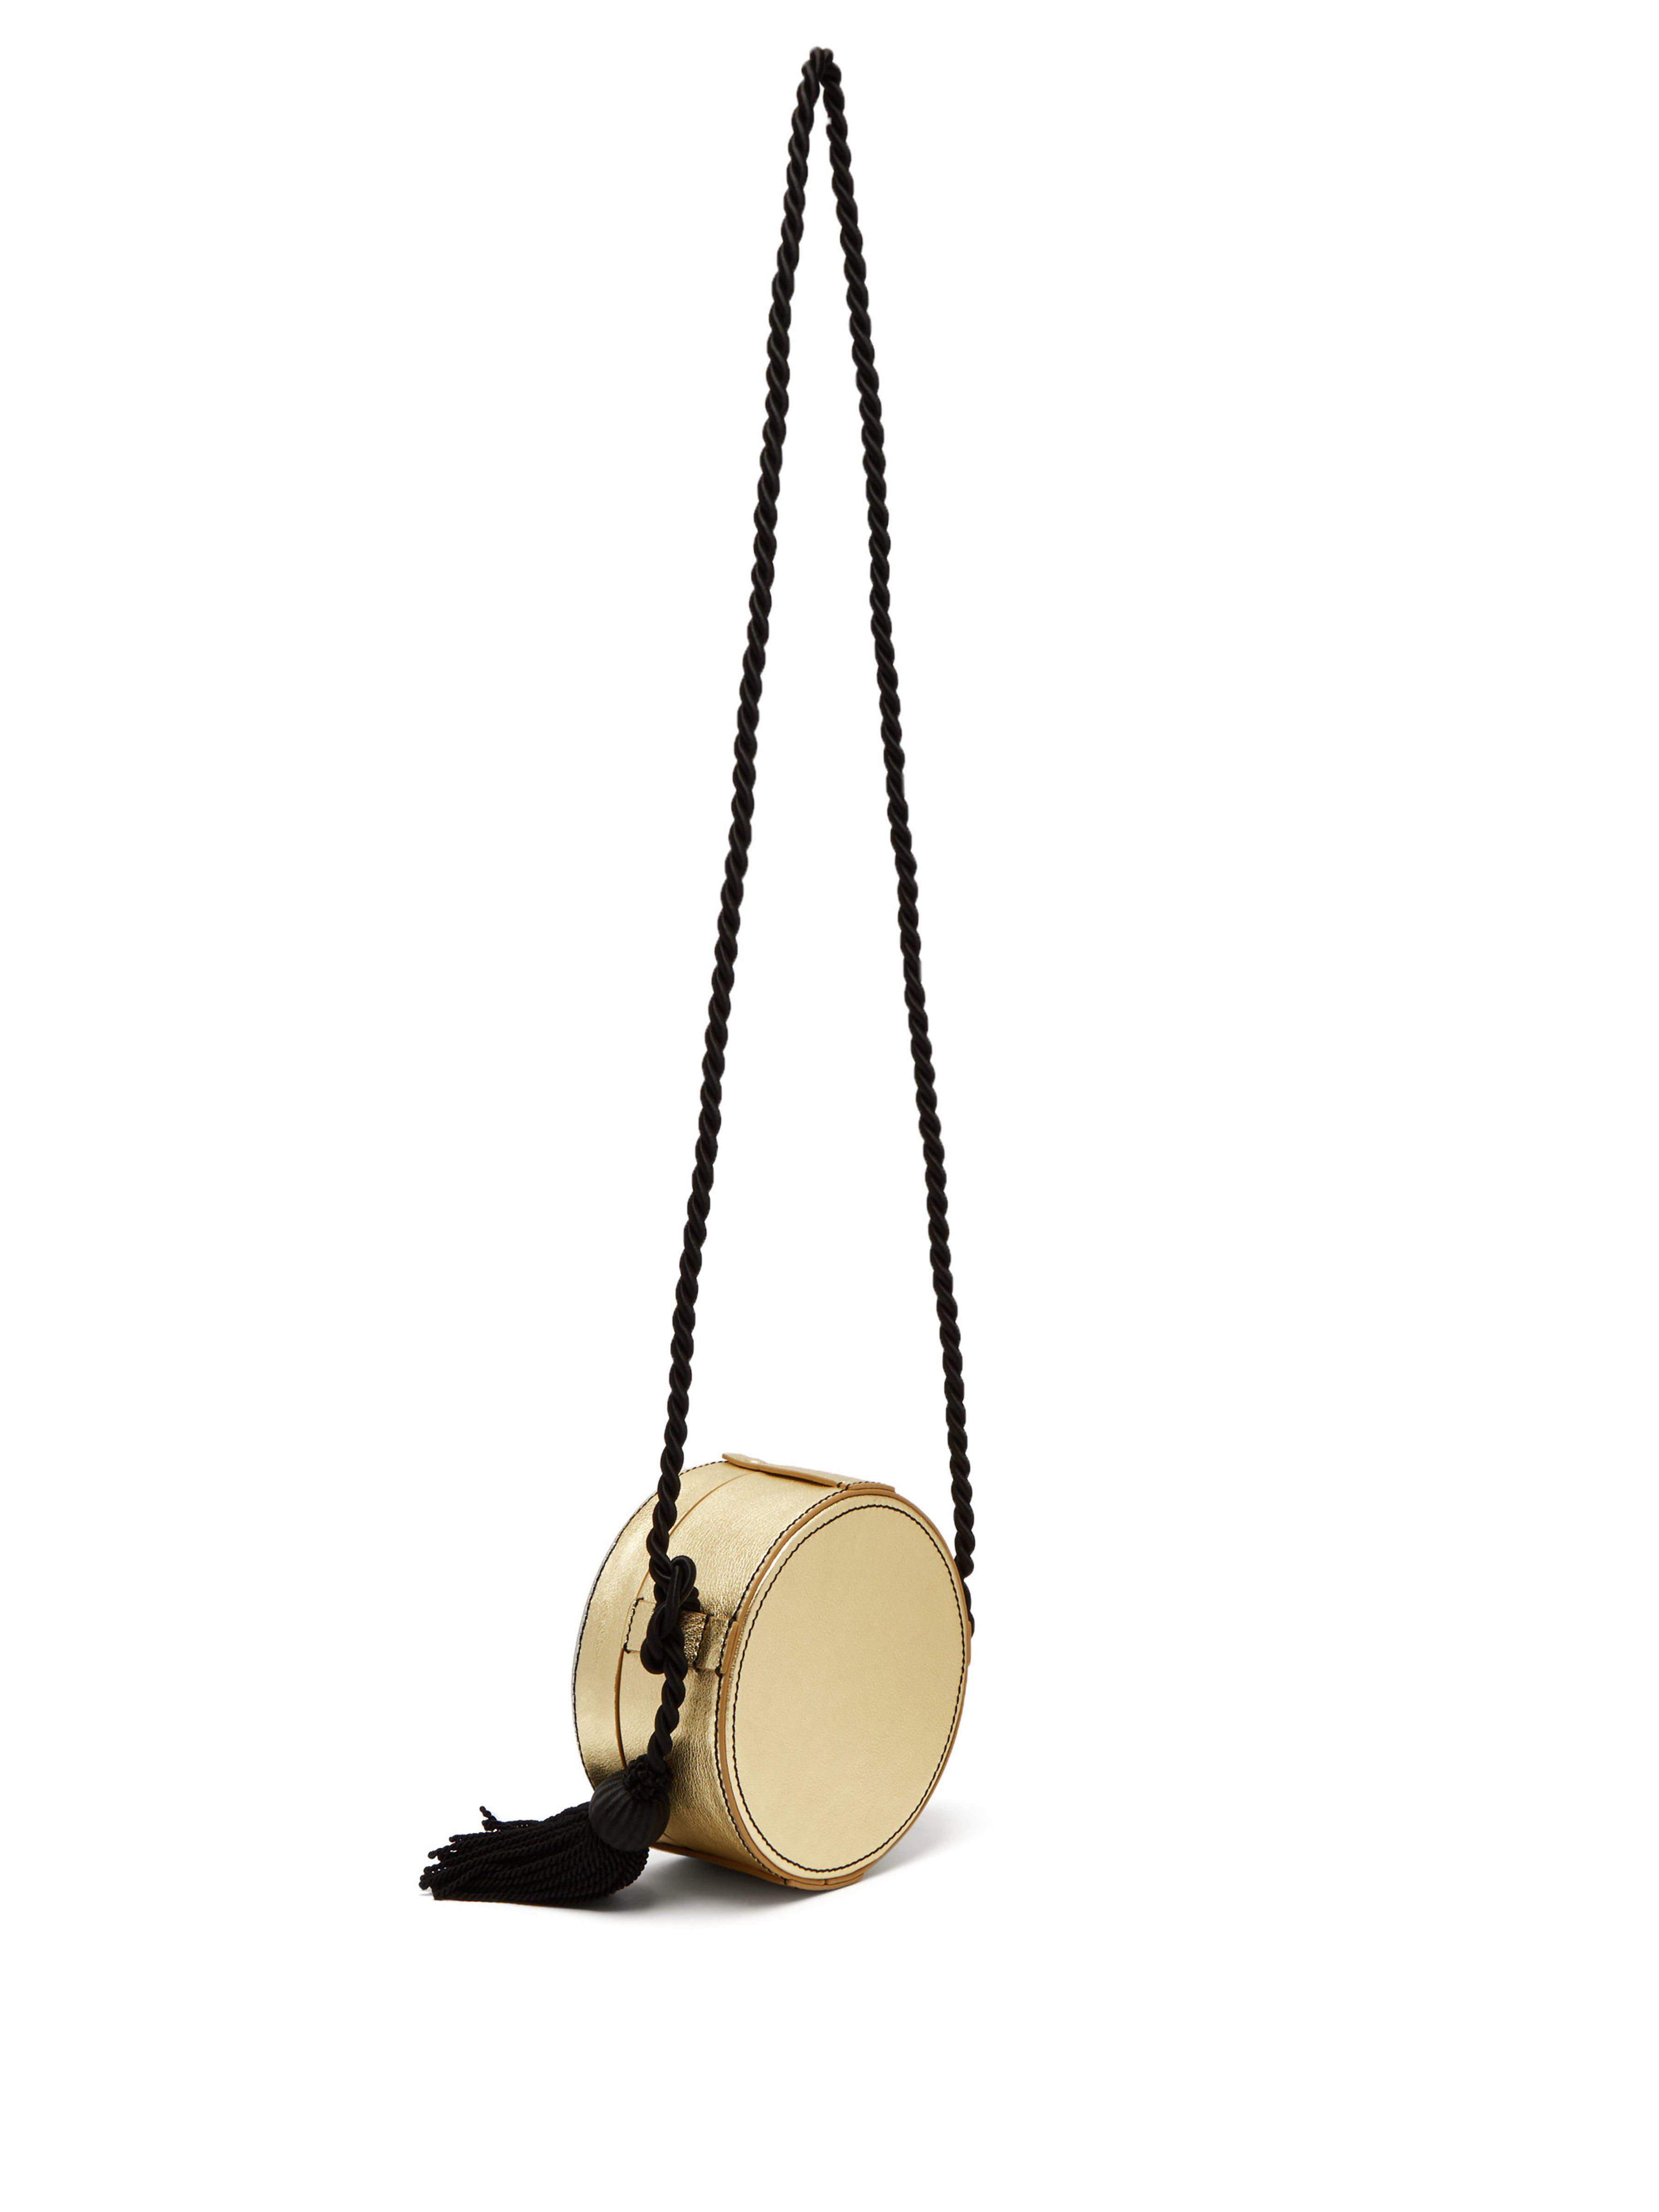 Hillier Bartley Leather Chevron Collar Box Cross Body Bag in Black Gold (Black)